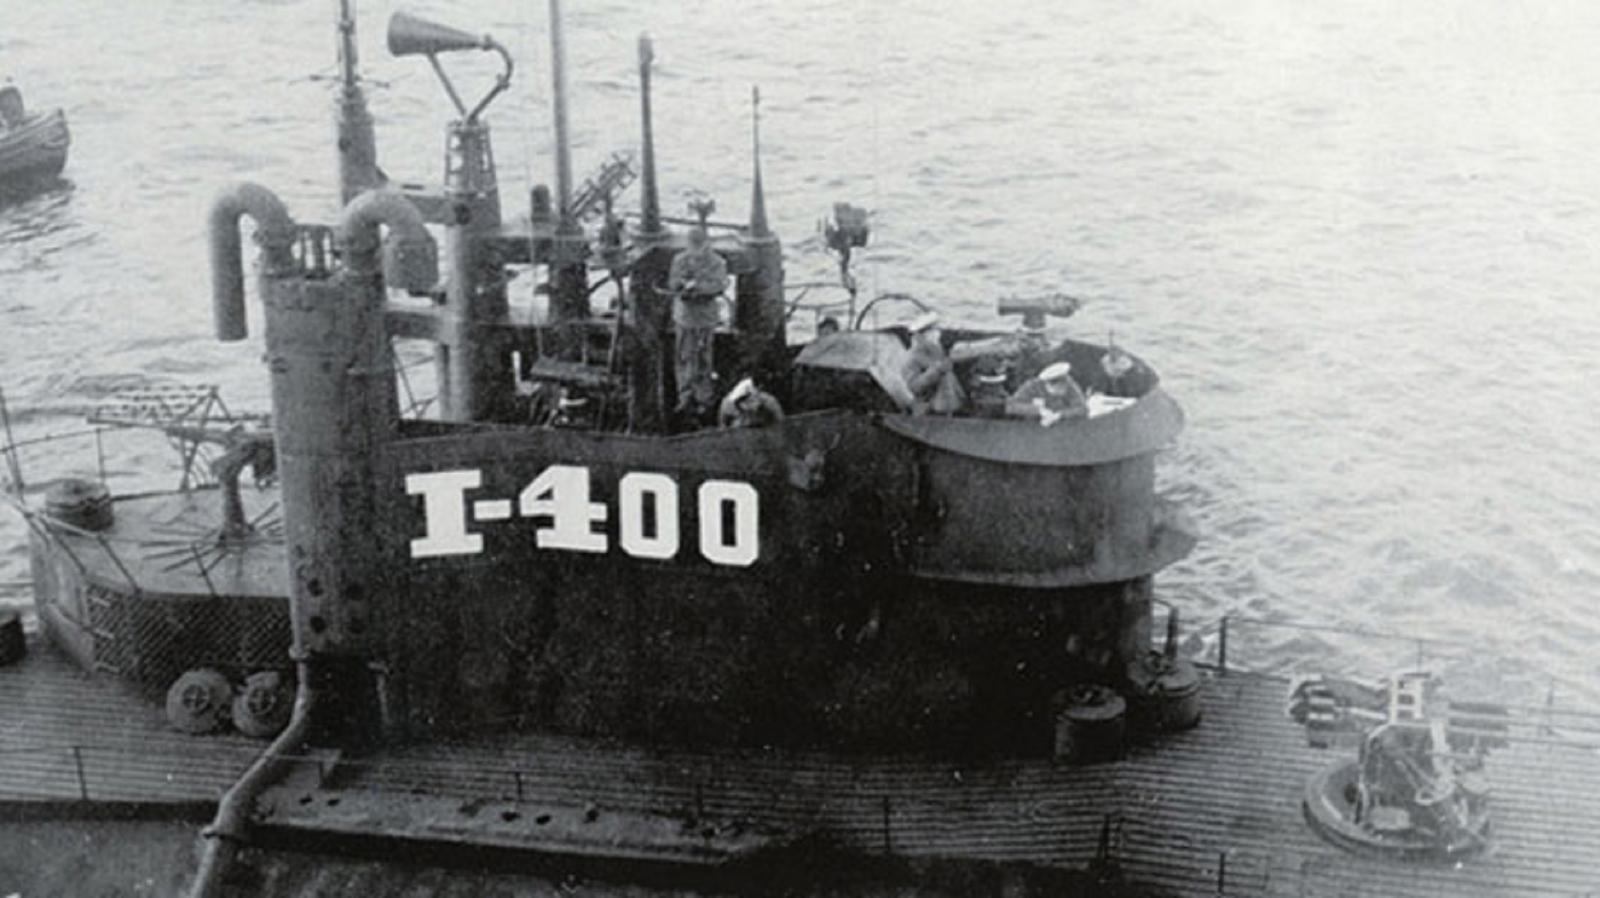 Imperial Japanese Navy mega-submarine I-400